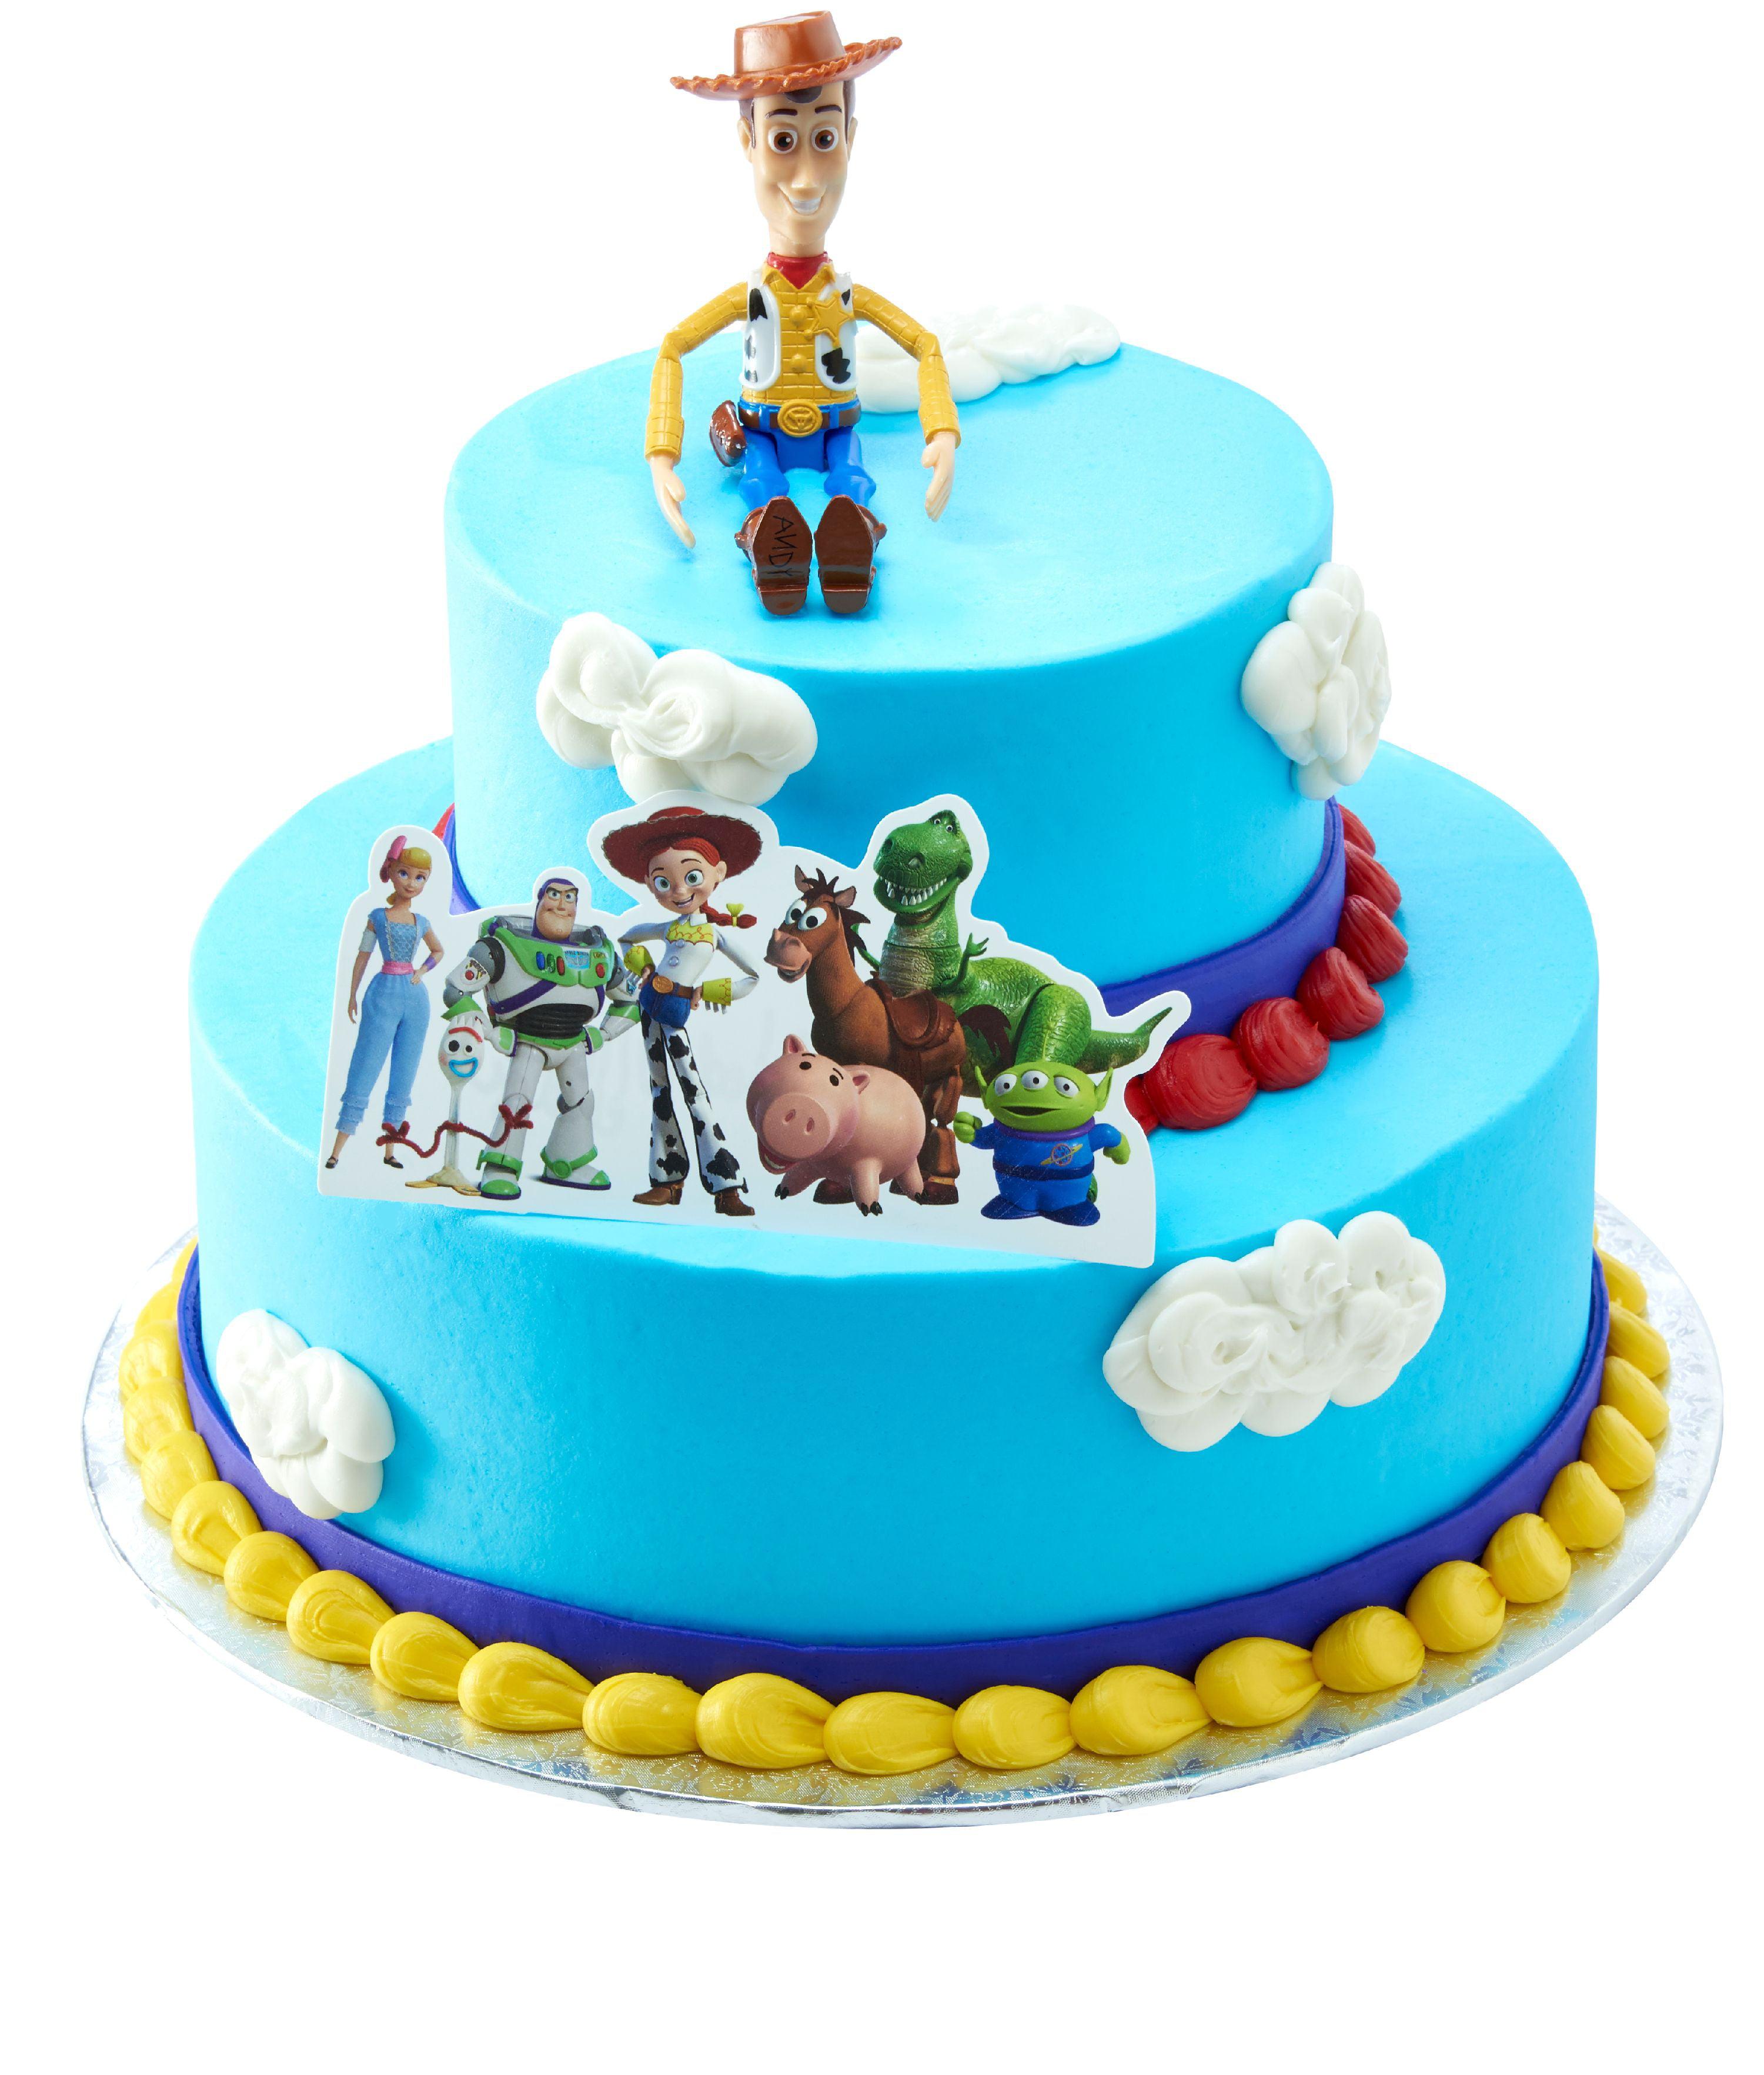 Marvelous Toy Story Two Tier Cake Walmart Com Walmart Com Birthday Cards Printable Trancafe Filternl